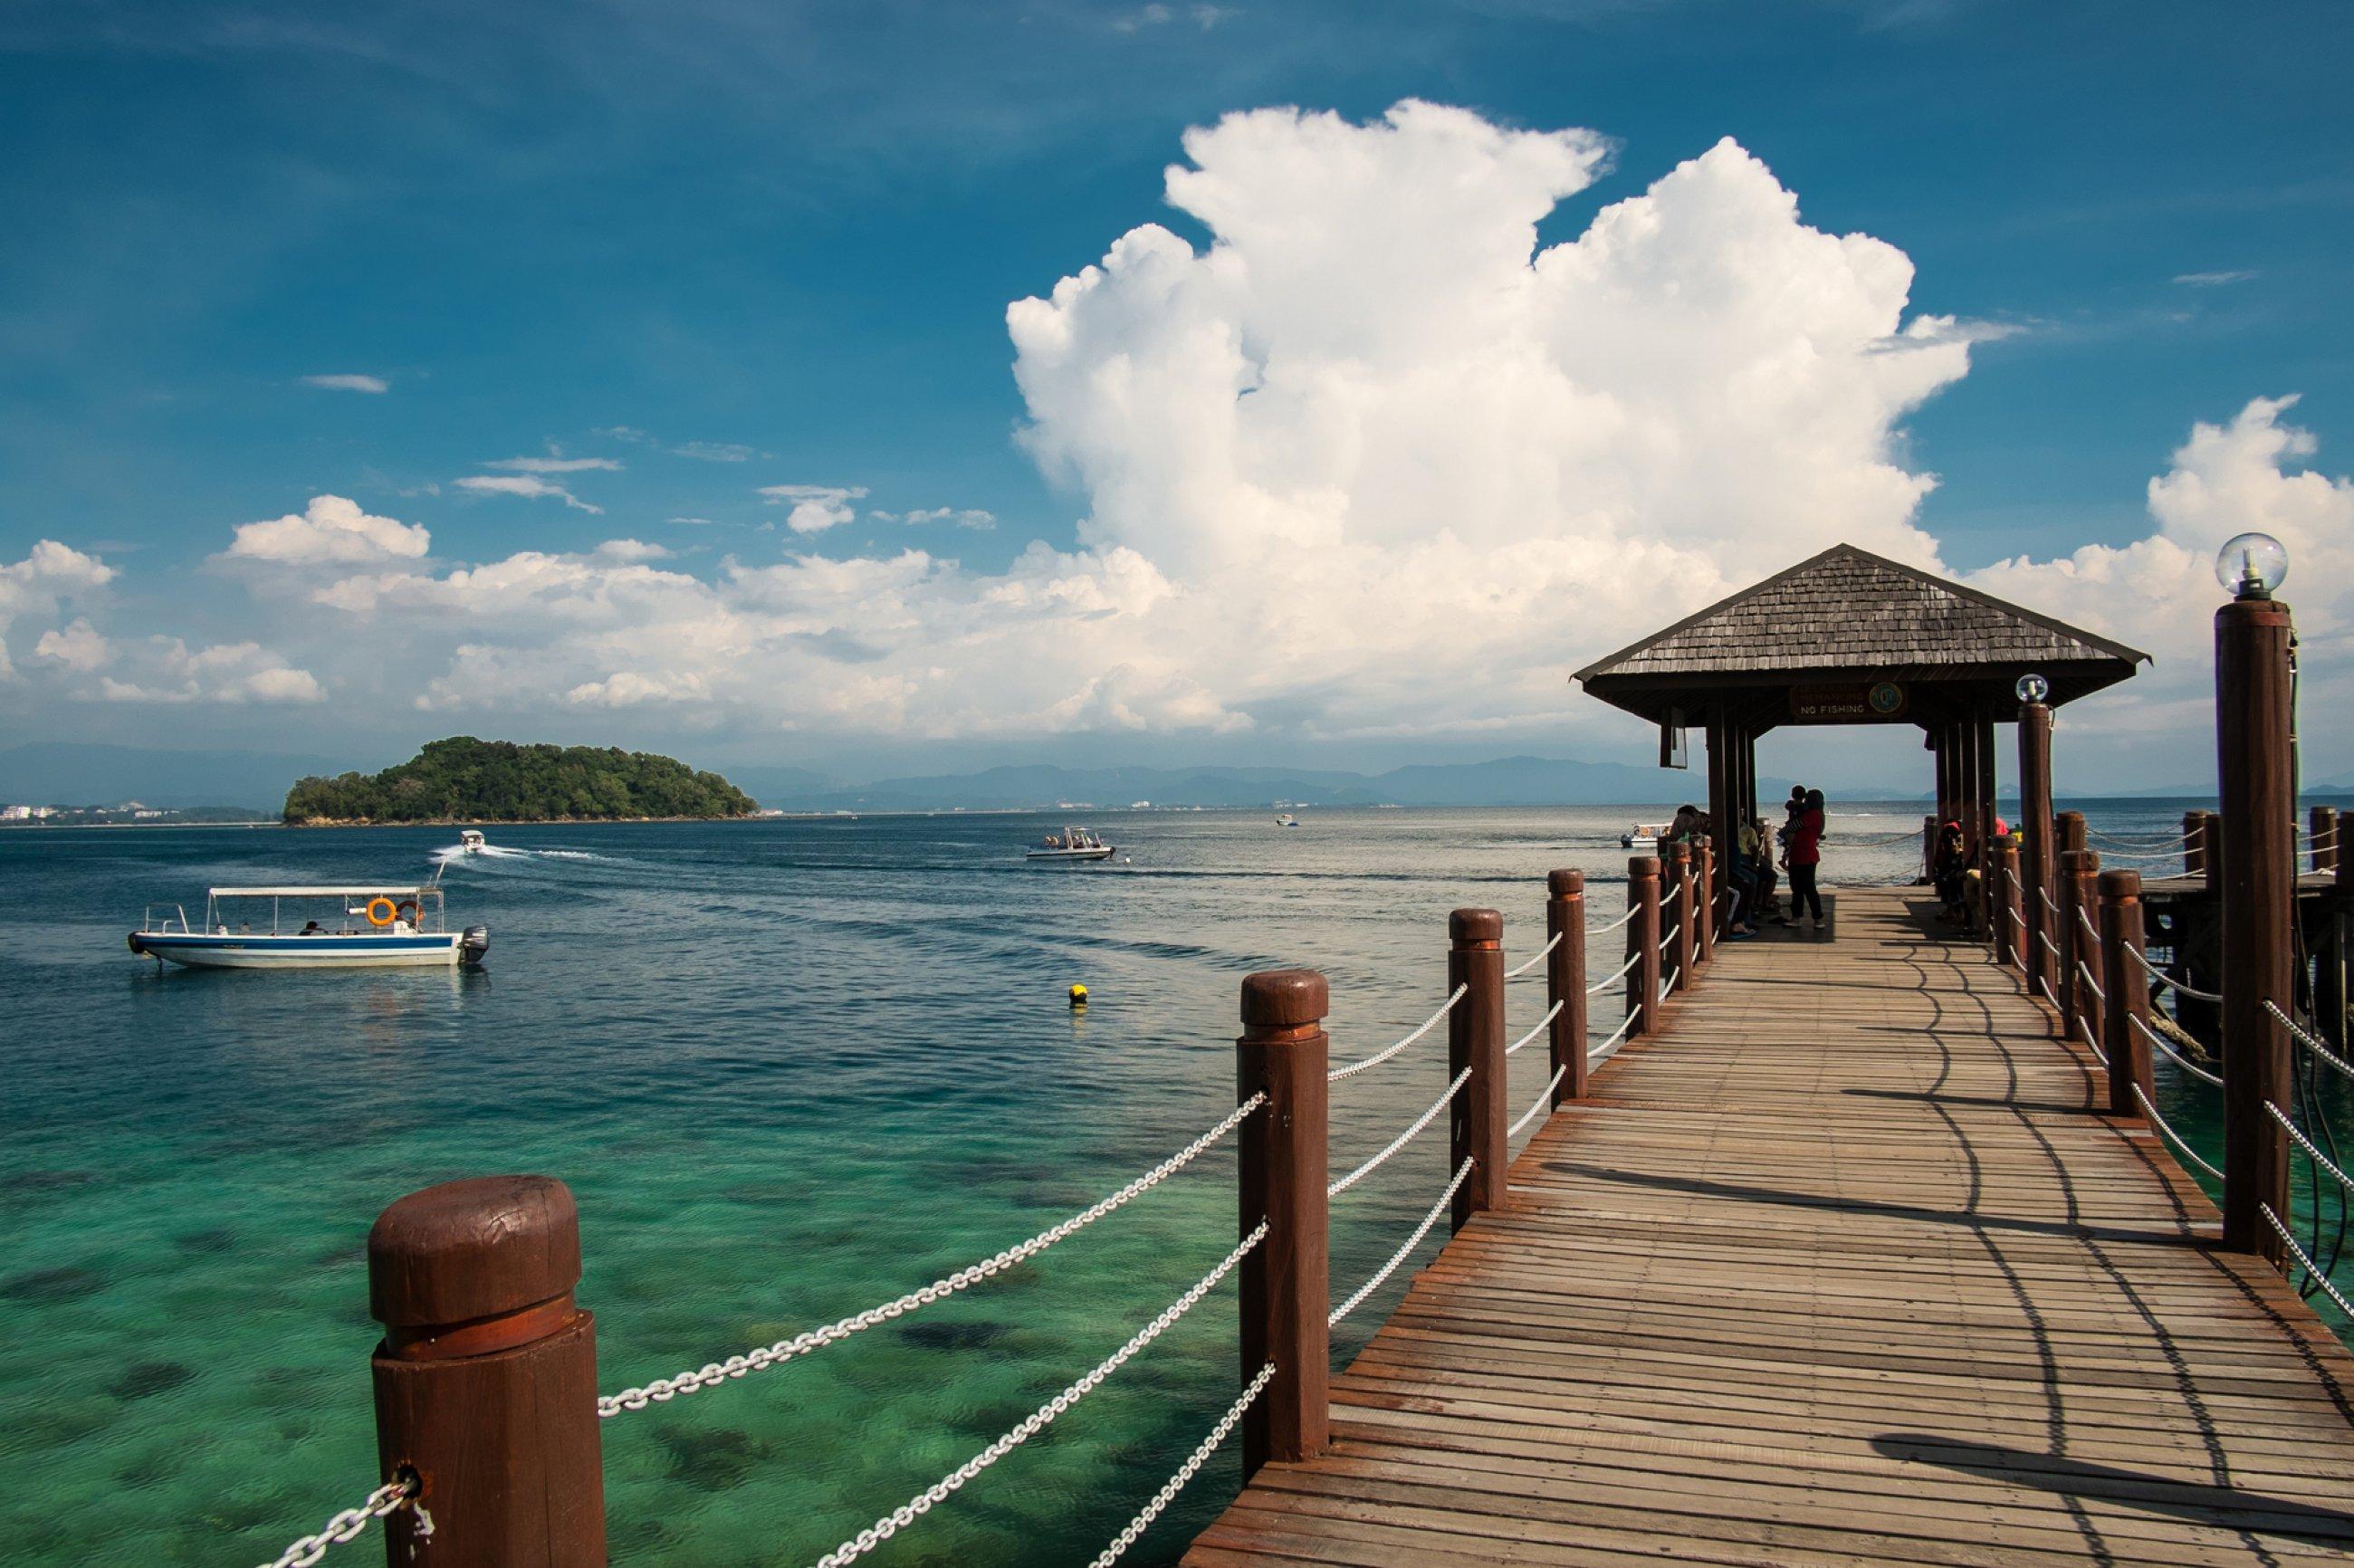 https://bubo.sk/uploads/galleries/4923/borneo-ostrov-manukan.jpg